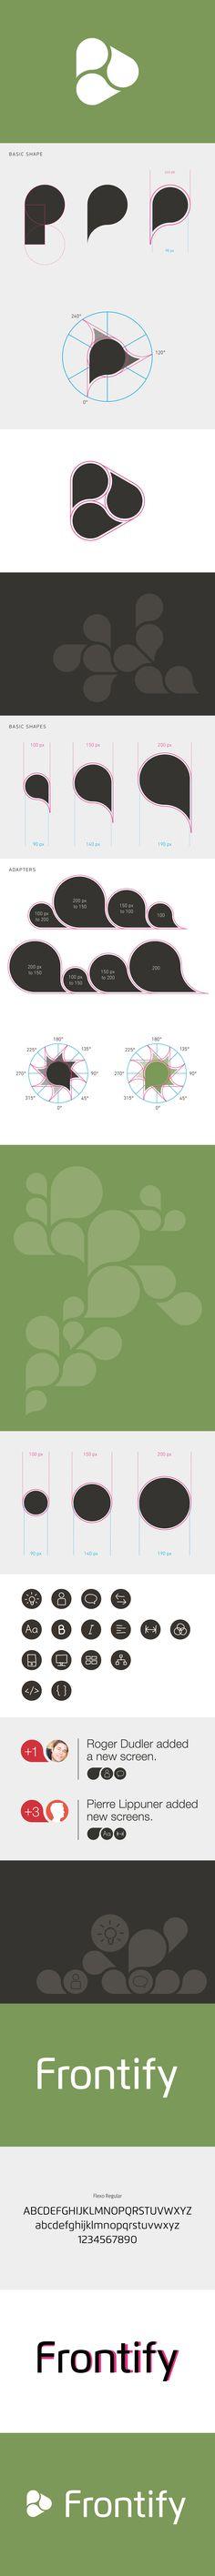 Frontify // Branding on Behance